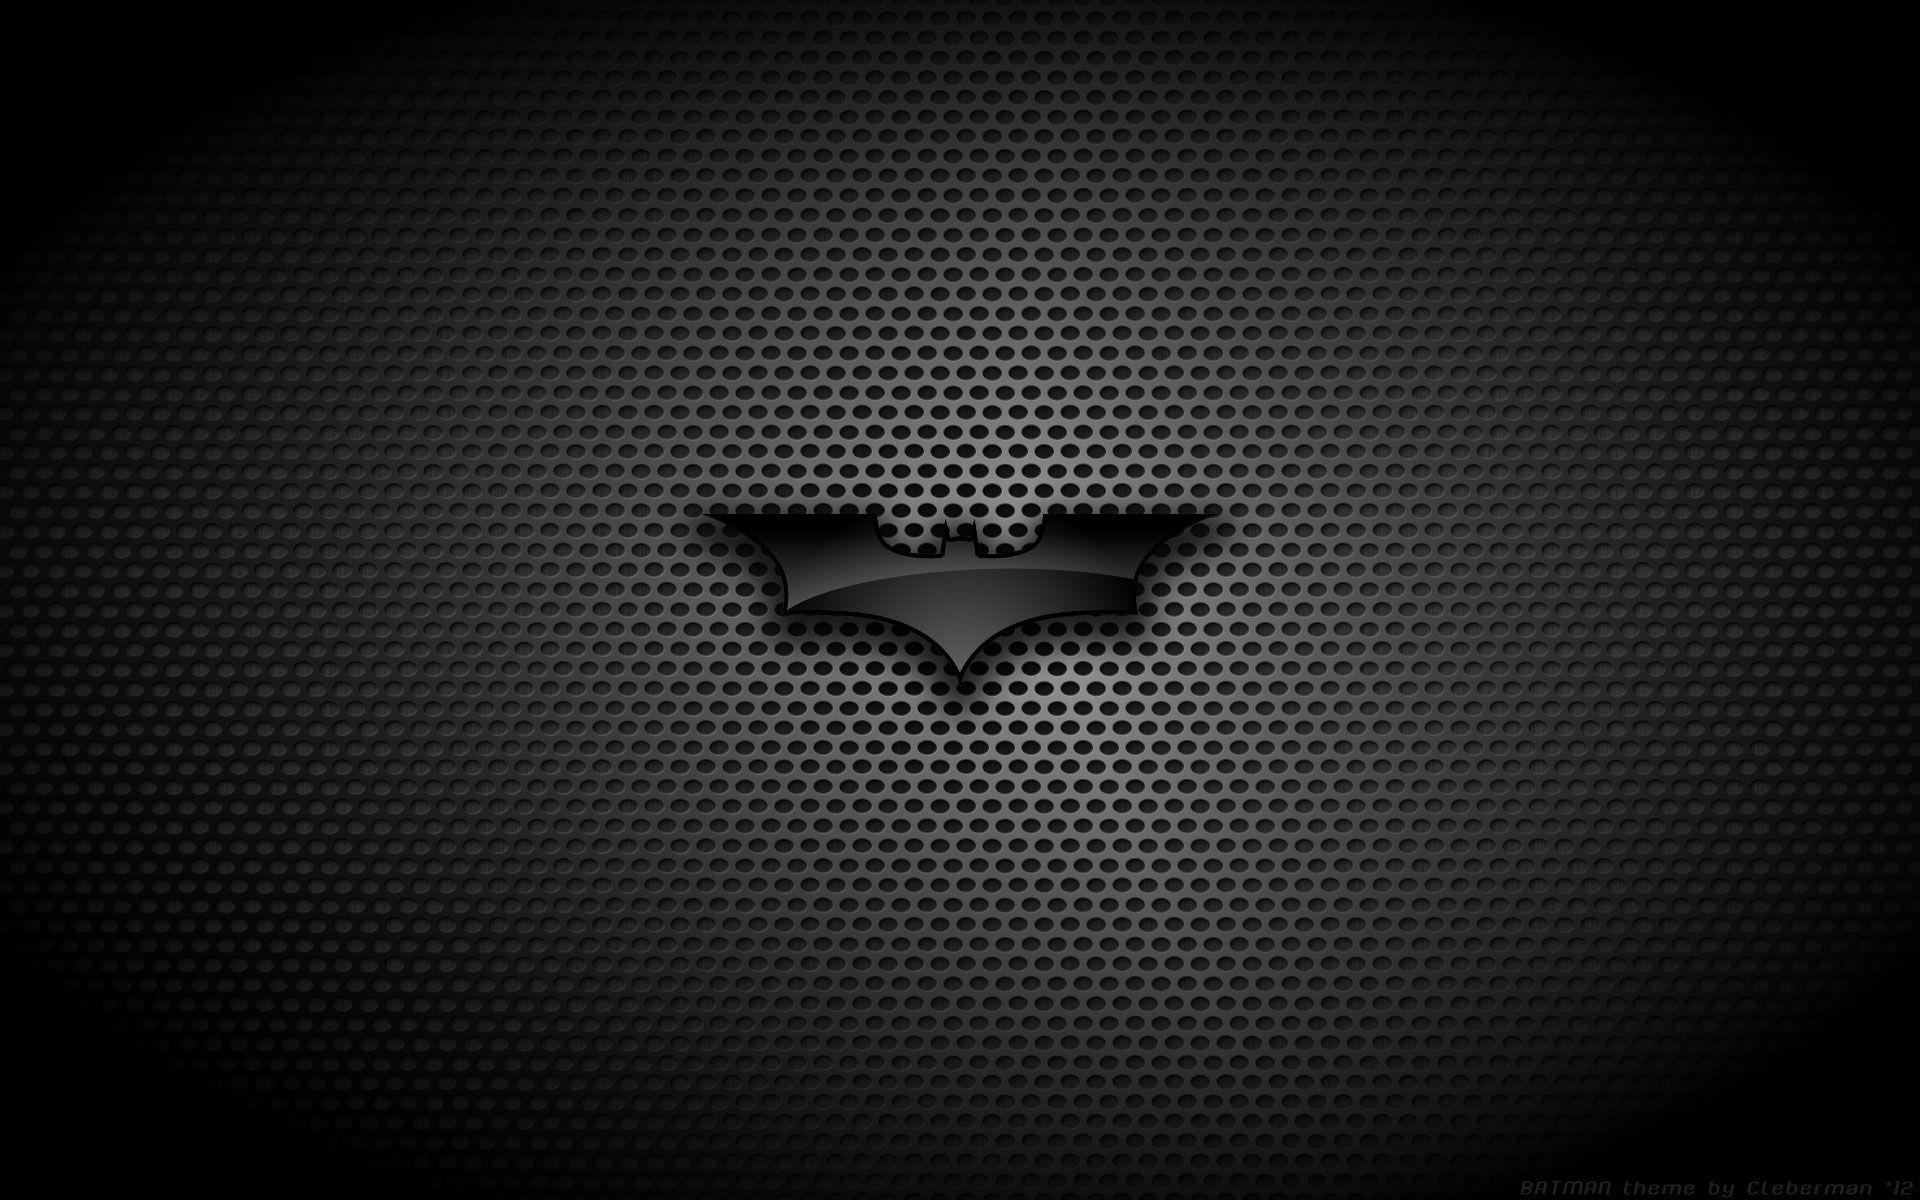 10 Best Batman Logo Wallpaper 1080p Hd Full Hd 1080p For Pc